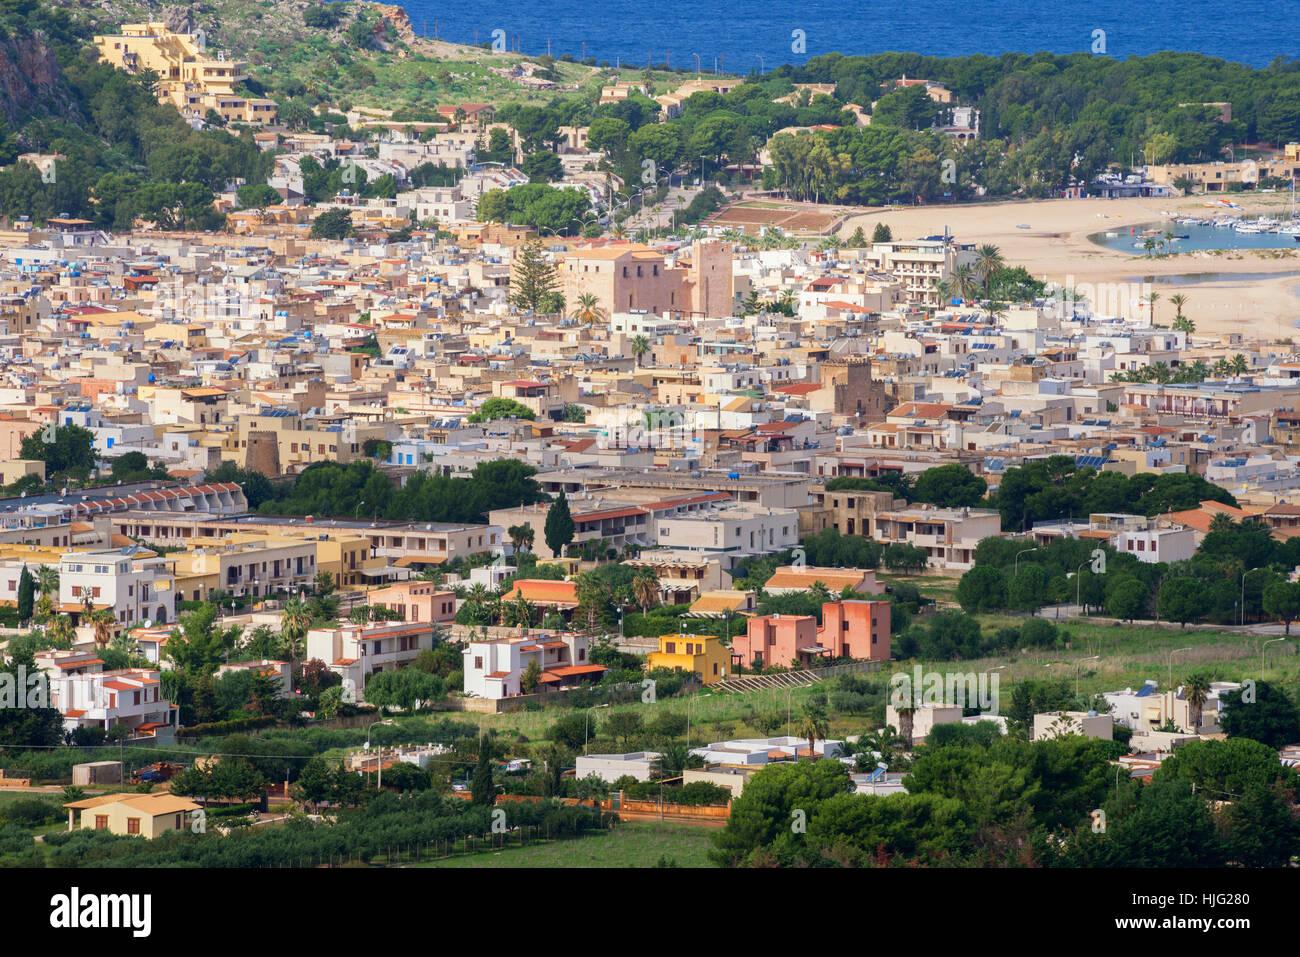 Blick auf San Vito lo Capo, Sizilien, Italien Stockbild